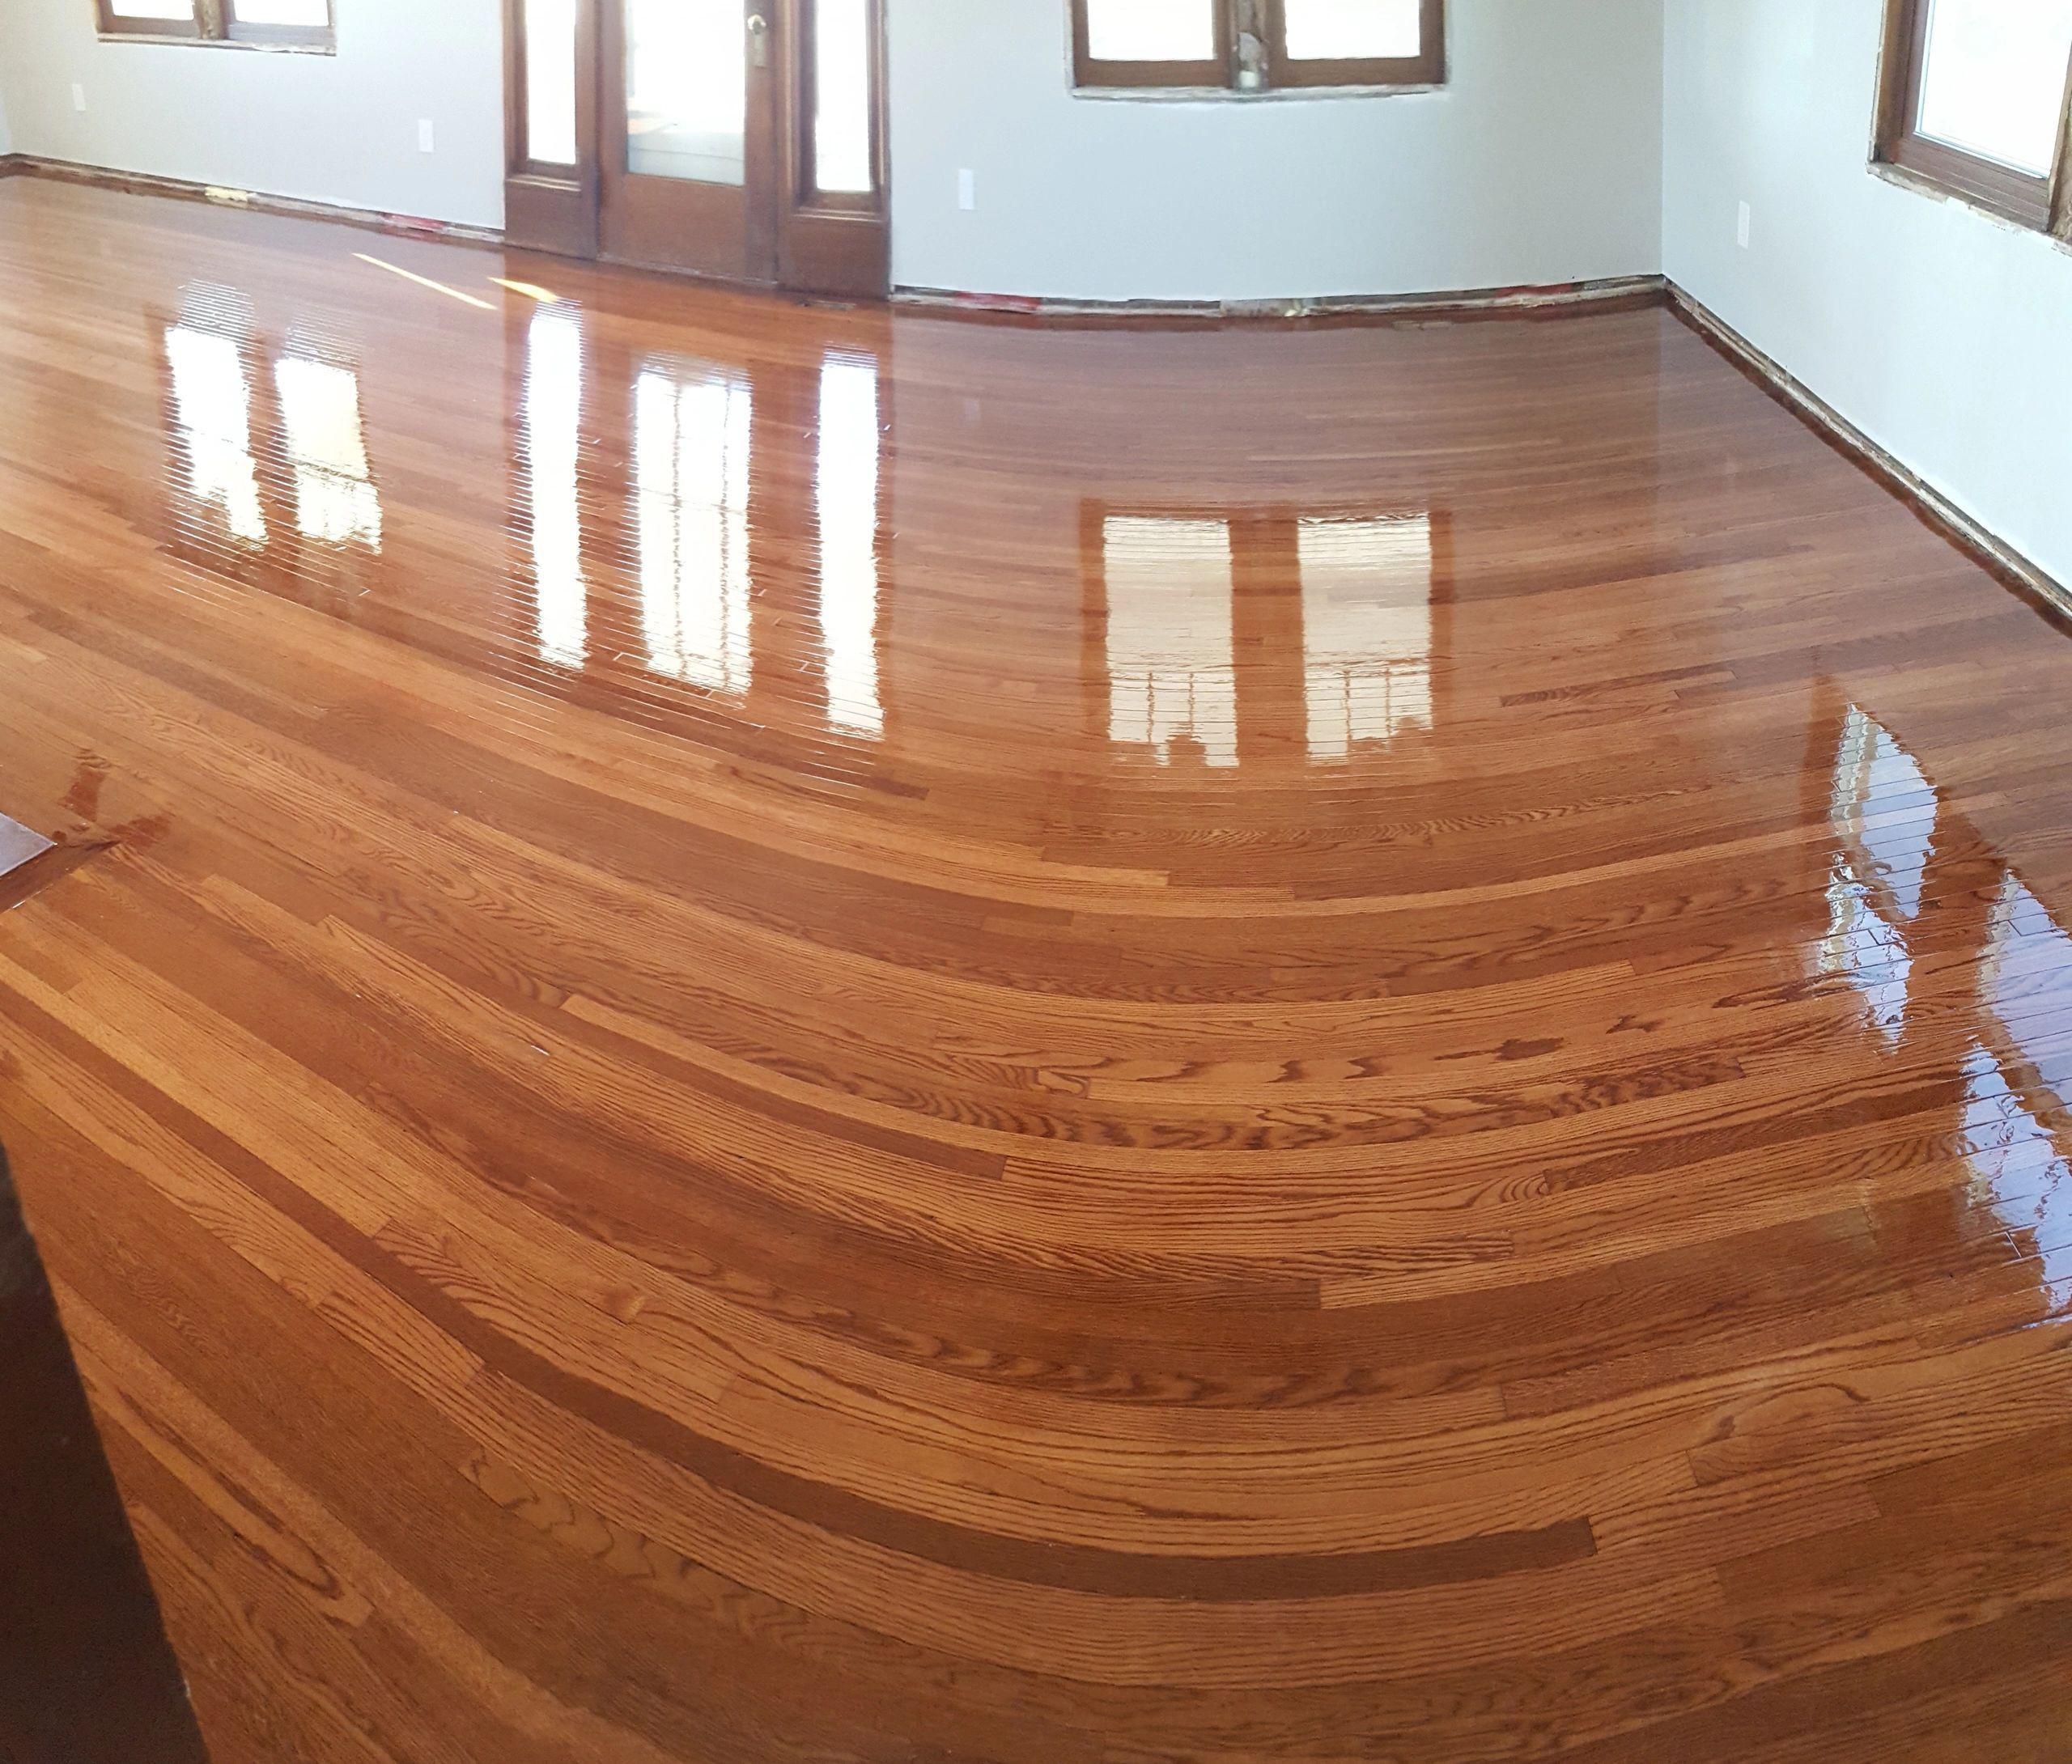 wholesale hardwood flooring portland oregon of hardwood floor refinishing floor plan ideas with hardwood floor refinishing wide plank distressed pine flooring cheap updated 2 5 17